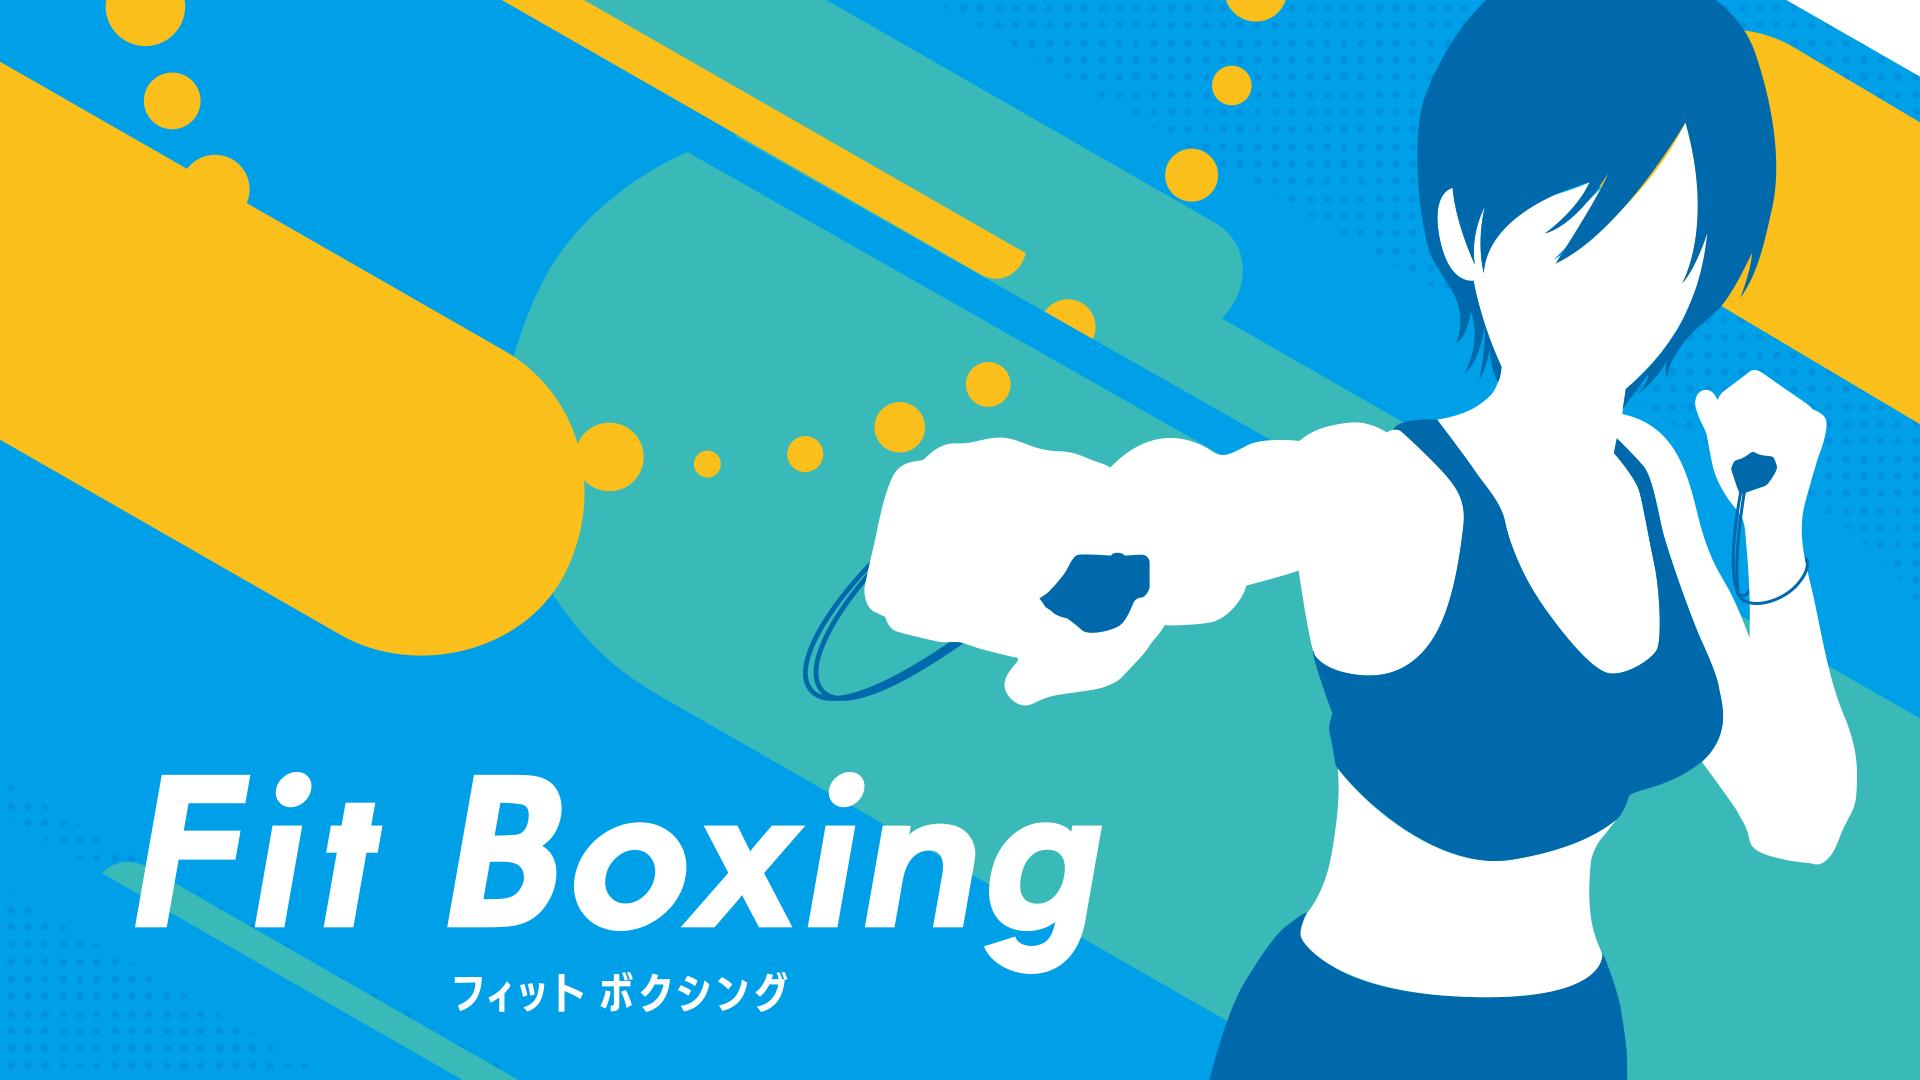 Nintendo Switch ソフト「Fit Boxing」発売日決定のお知らせ